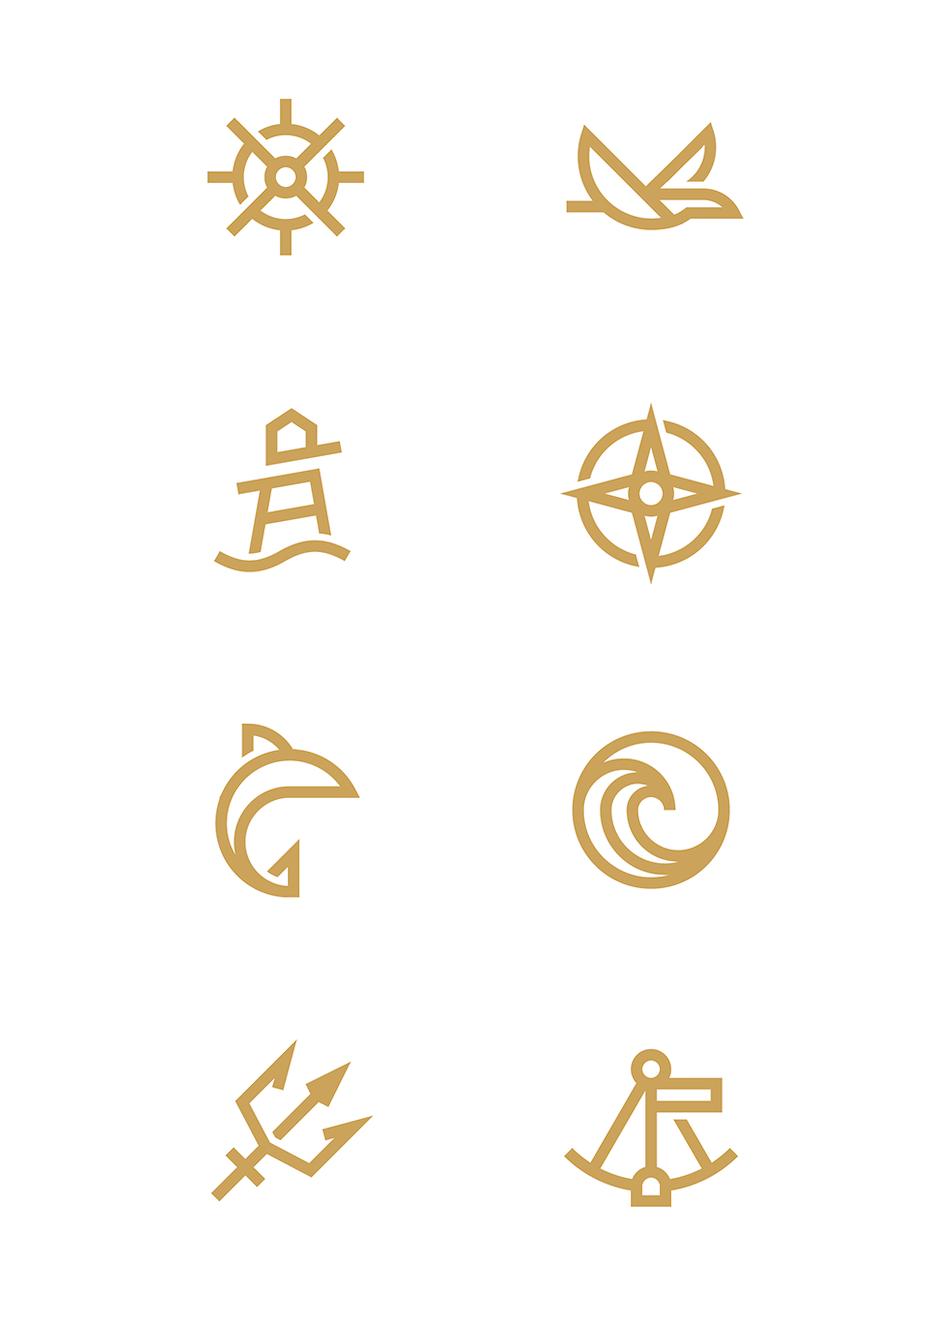 Nautical icon designs